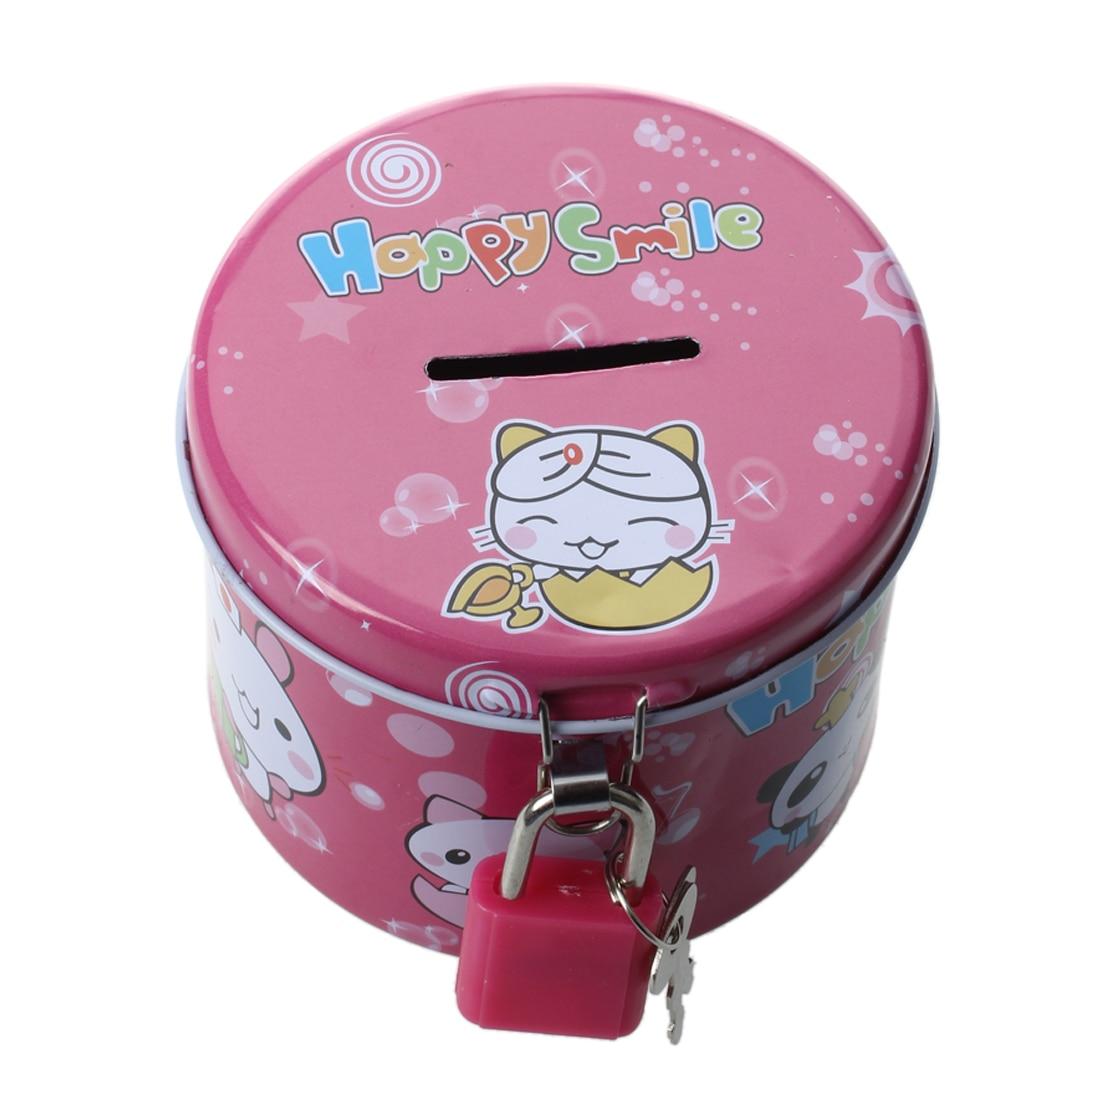 Cylinder Design Cartoon Print Piggy Bank Coin Money Savings Box with Visací zámek